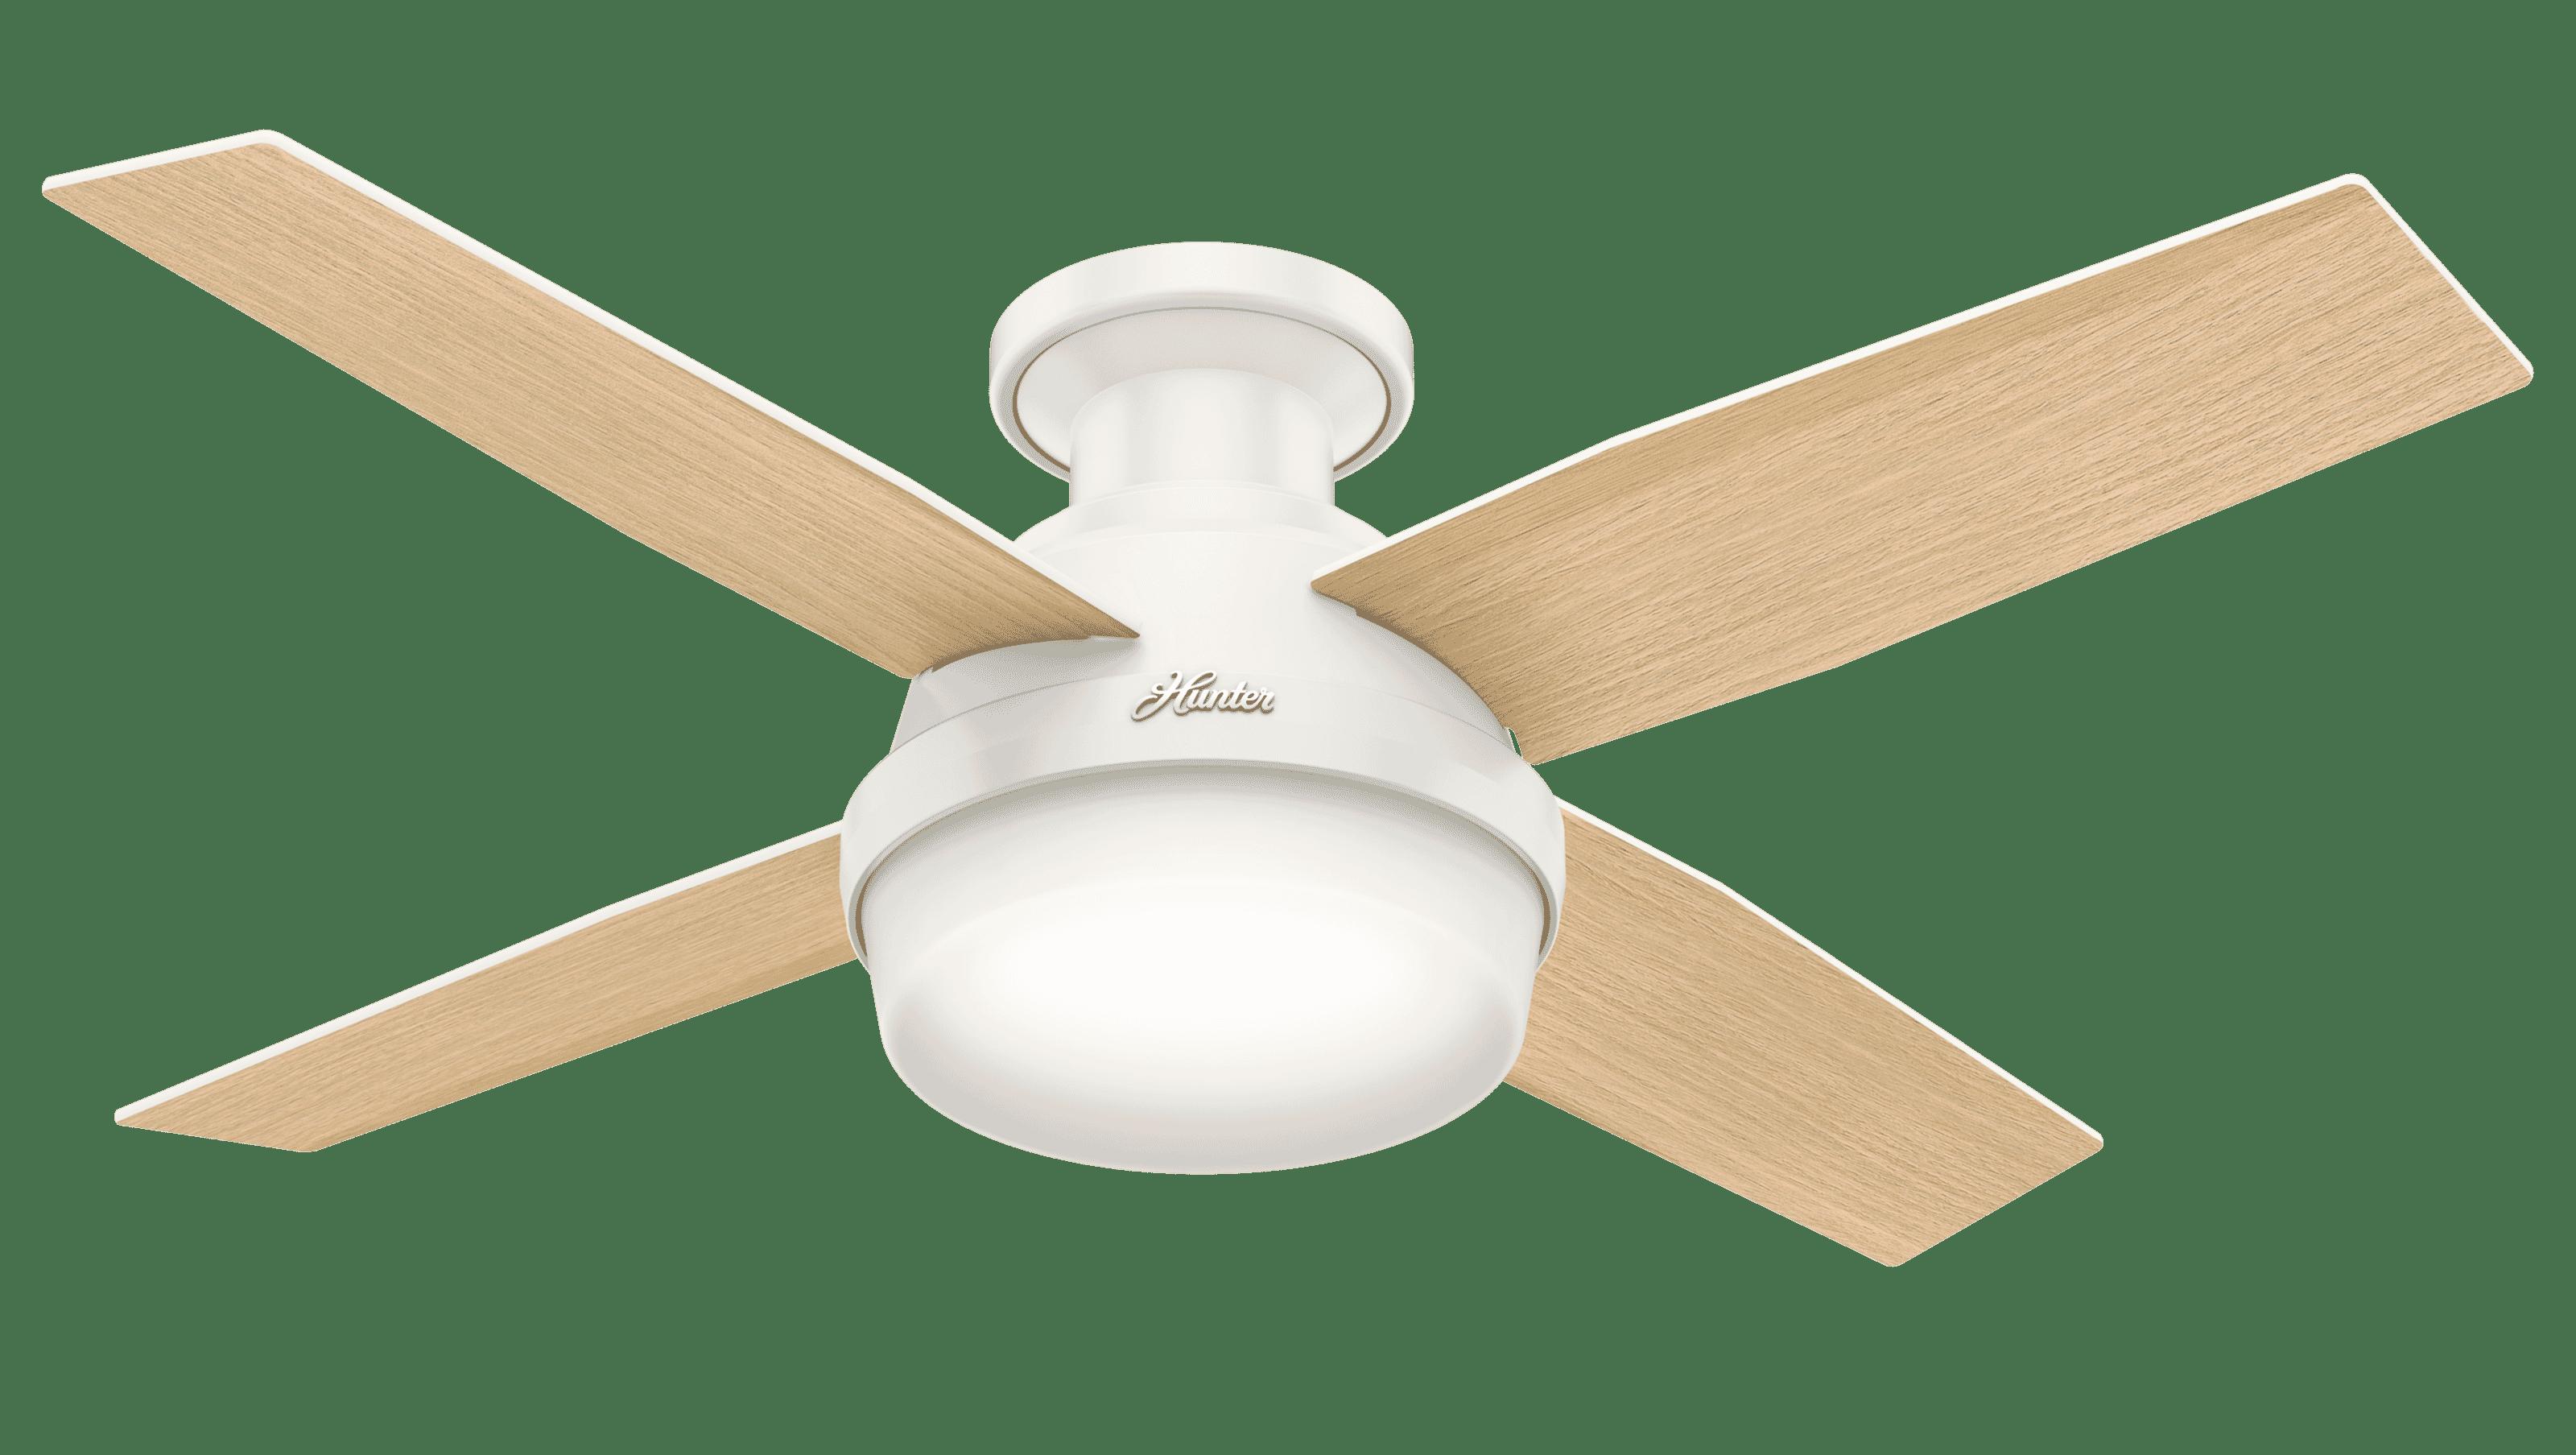 Hunter Dempsey 2-Light 44-inch Flush Mount Ceiling Fan in Fresh White